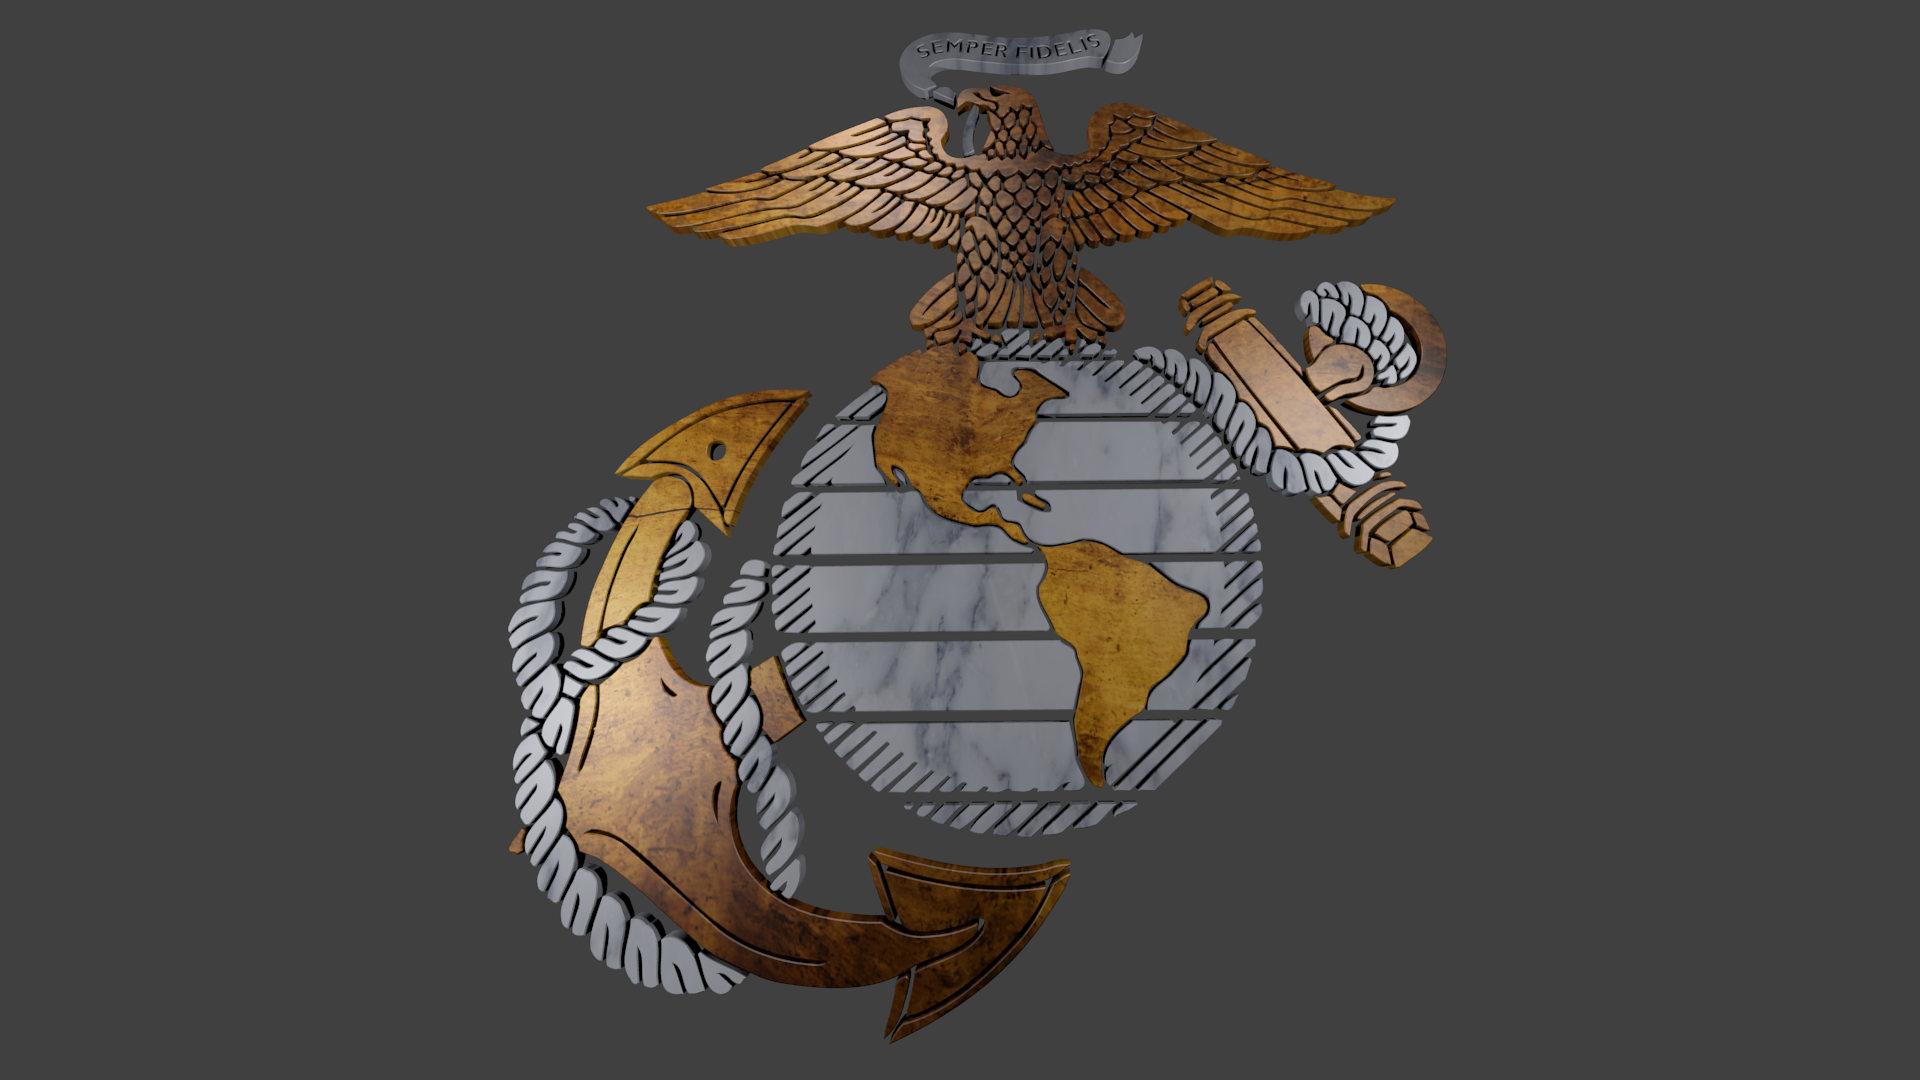 Usmc Wallpaper 1920x1080 Marines USMC military ...